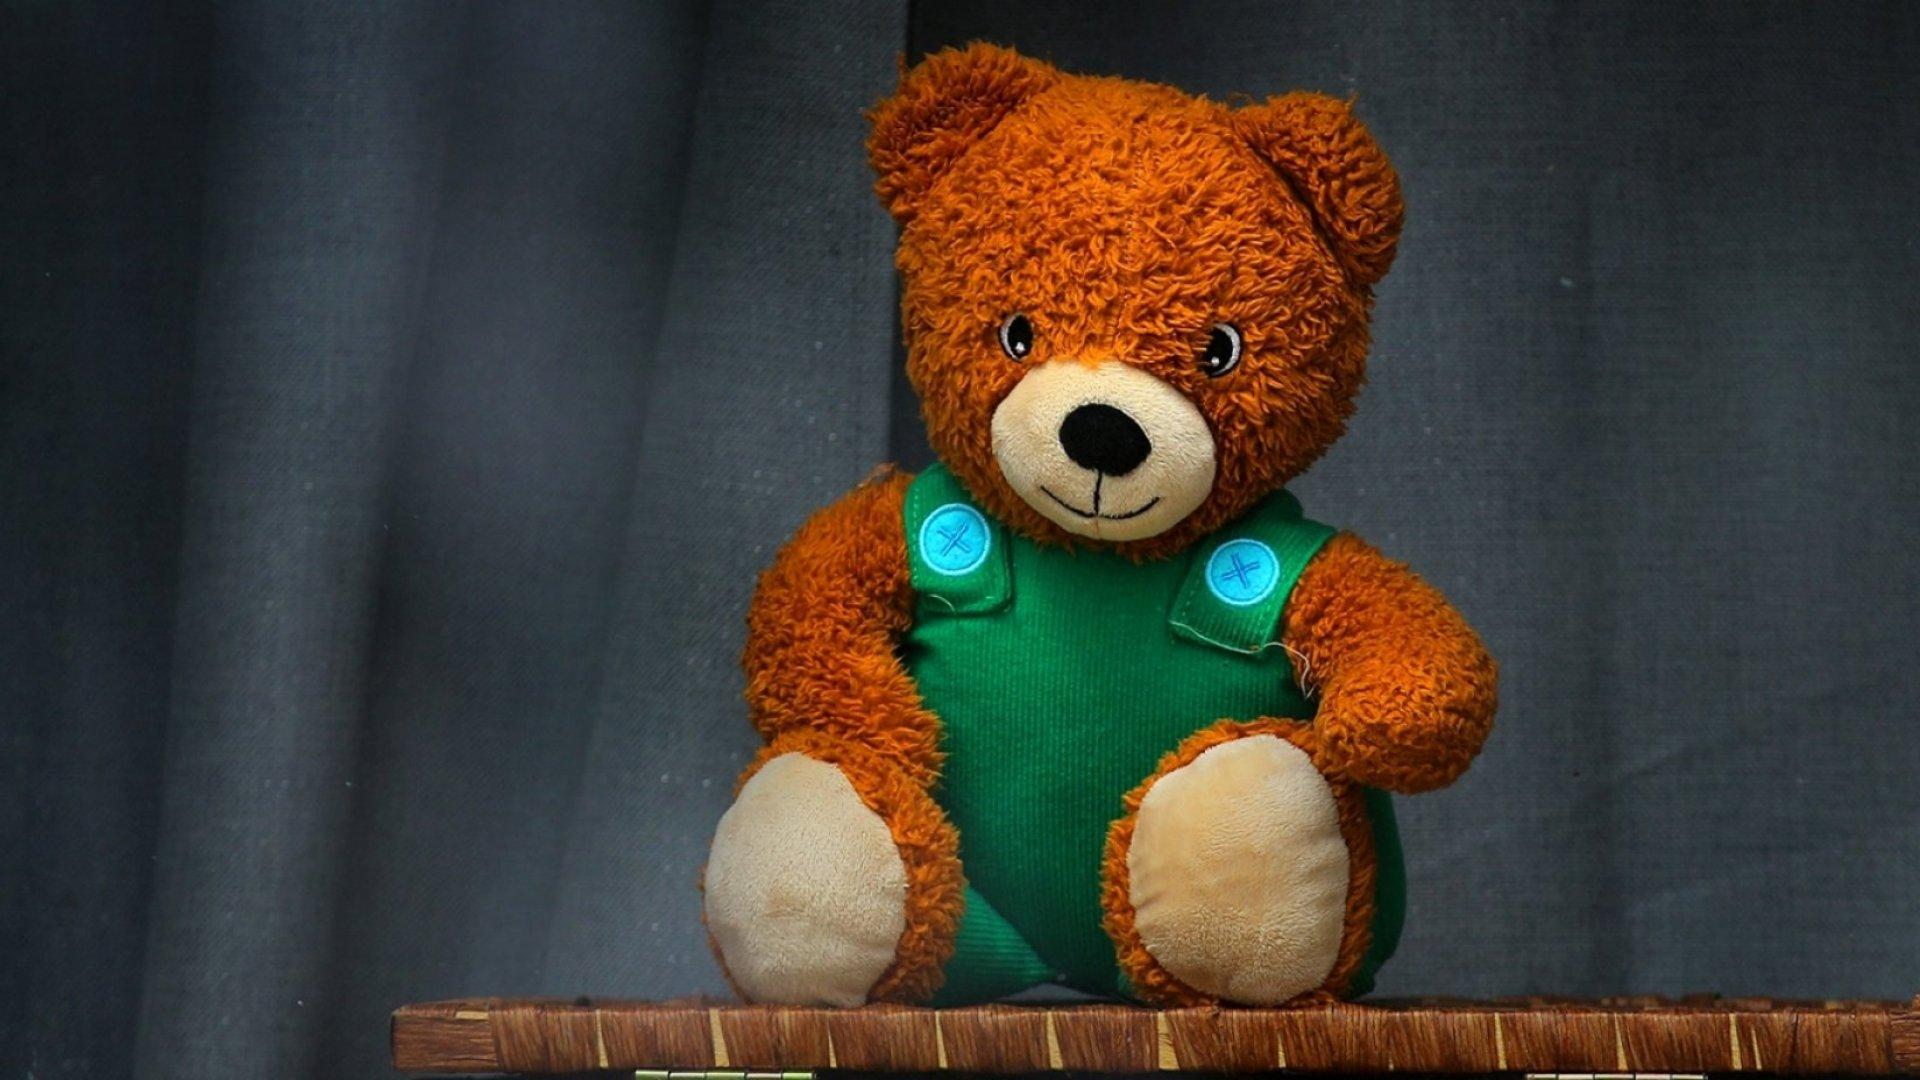 A teddy bear on display in a window in Boston.